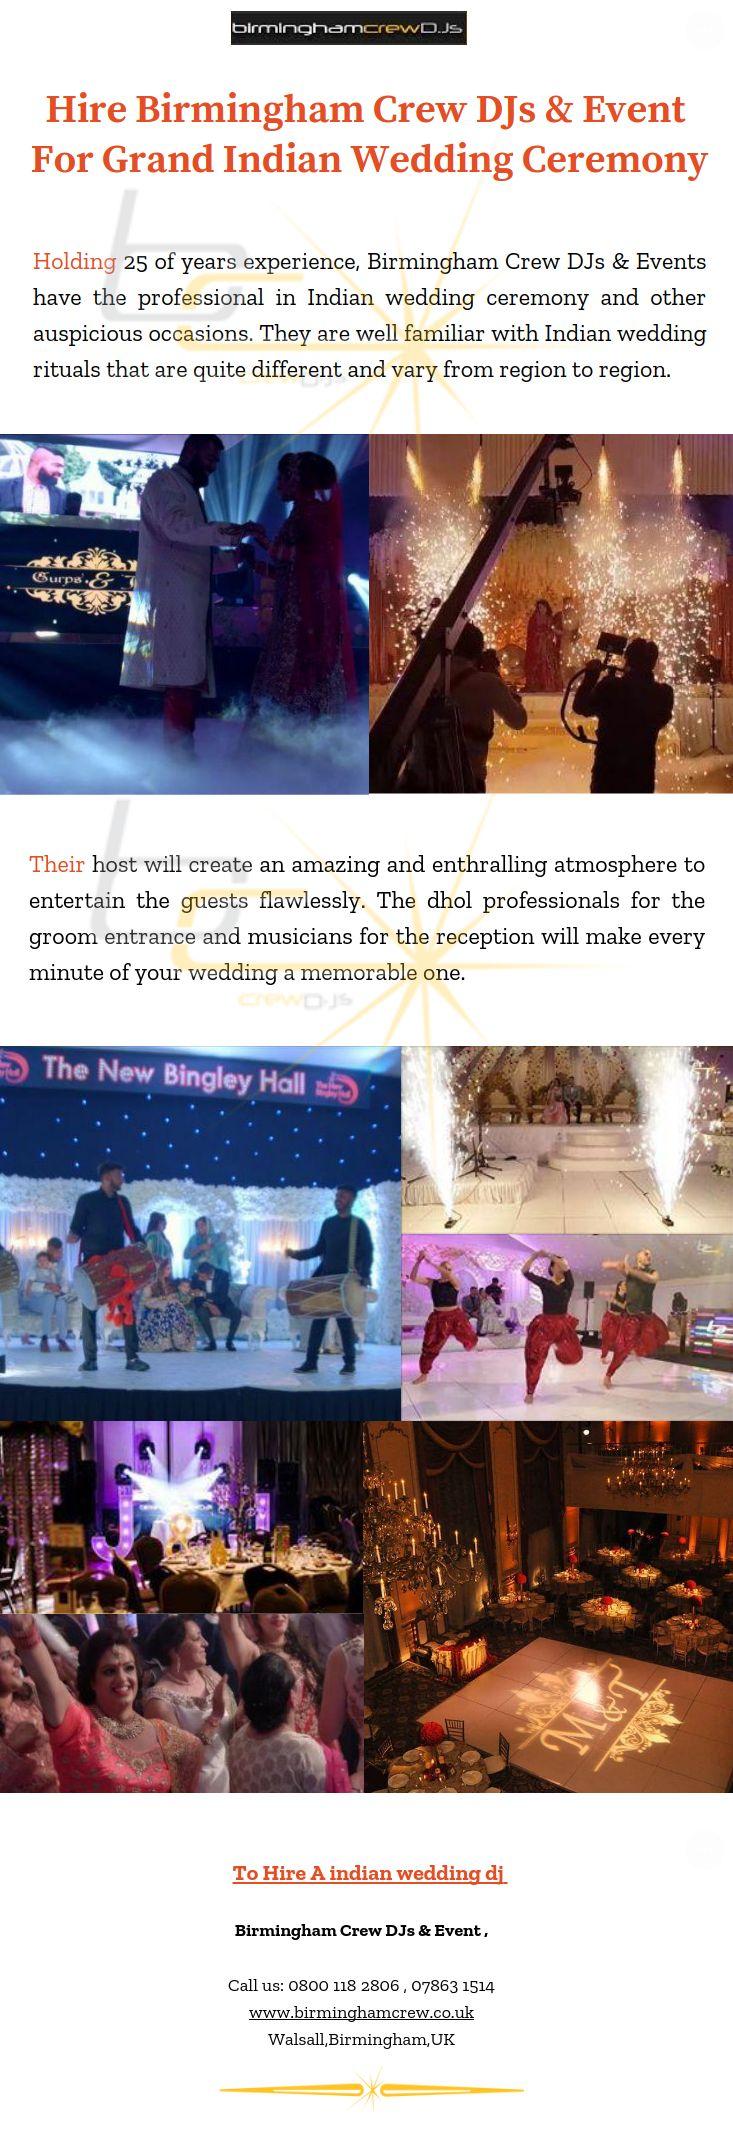 Hire Birmingham Crew Djs Event For Grand Indian Wedding Ceremony Indian Wedding Ceremony Wedding Ceremony Wedding Ceremony Programs